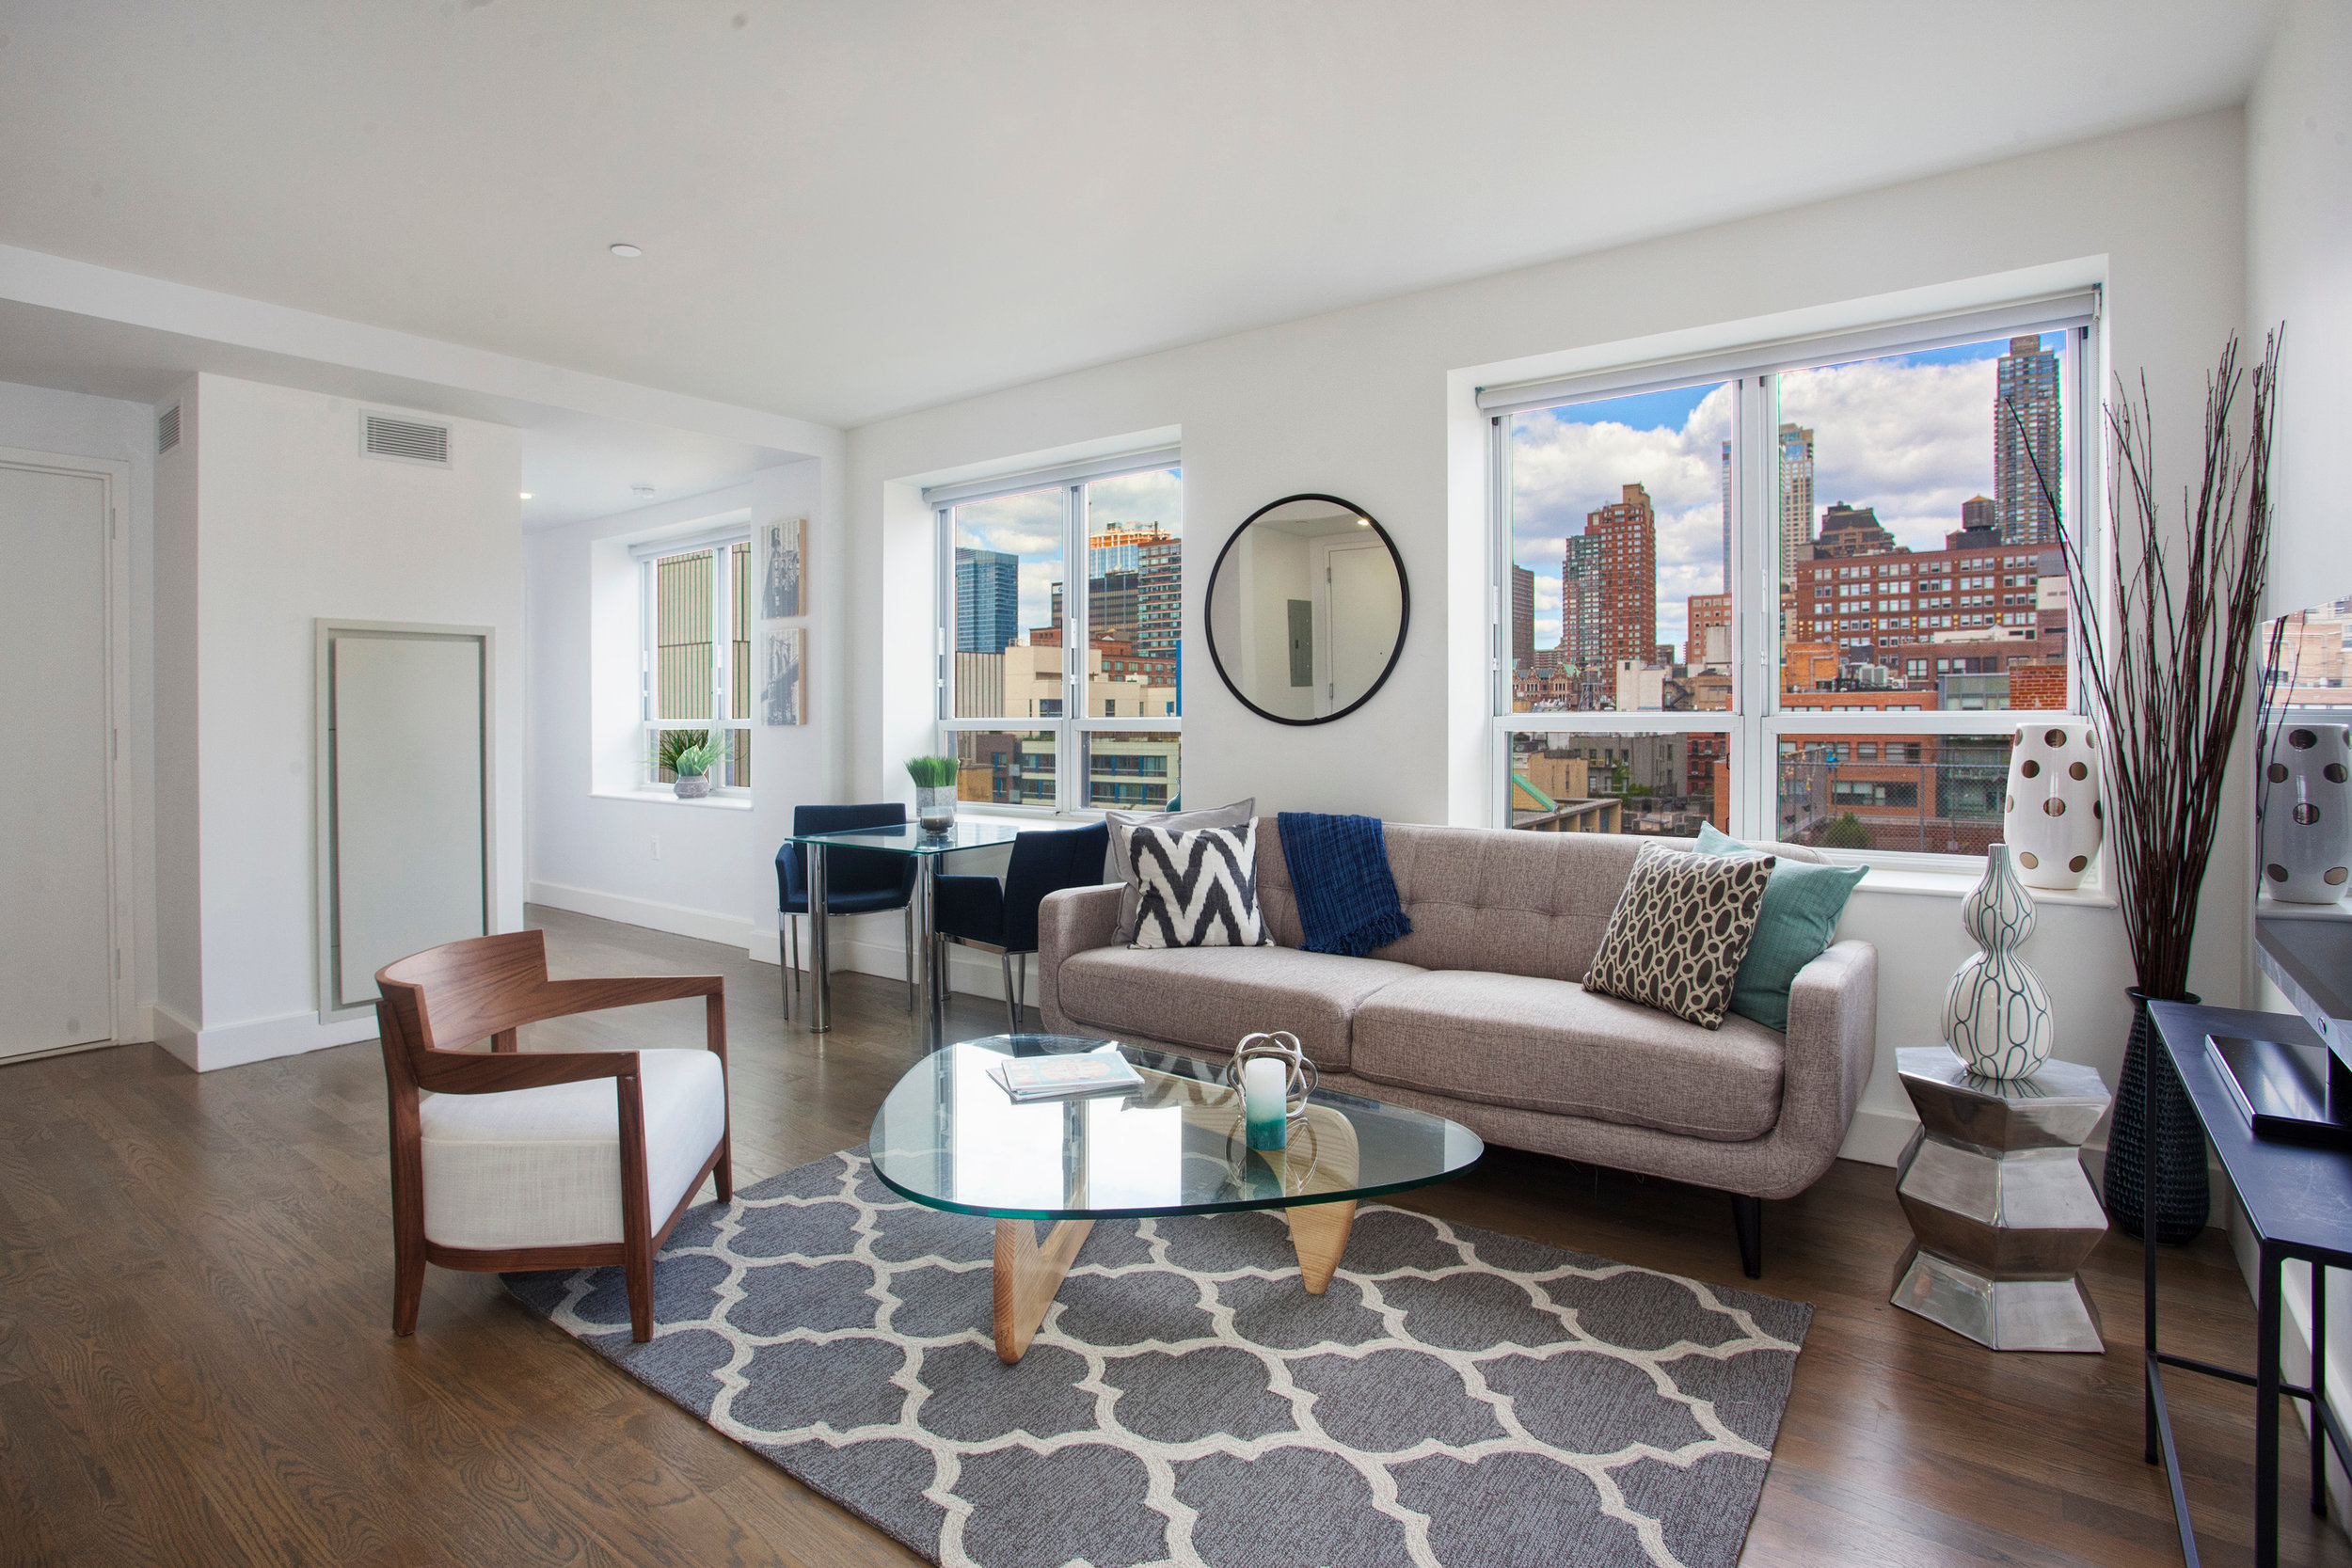 432 West 52nd Street, #PH7H - $1,150,000